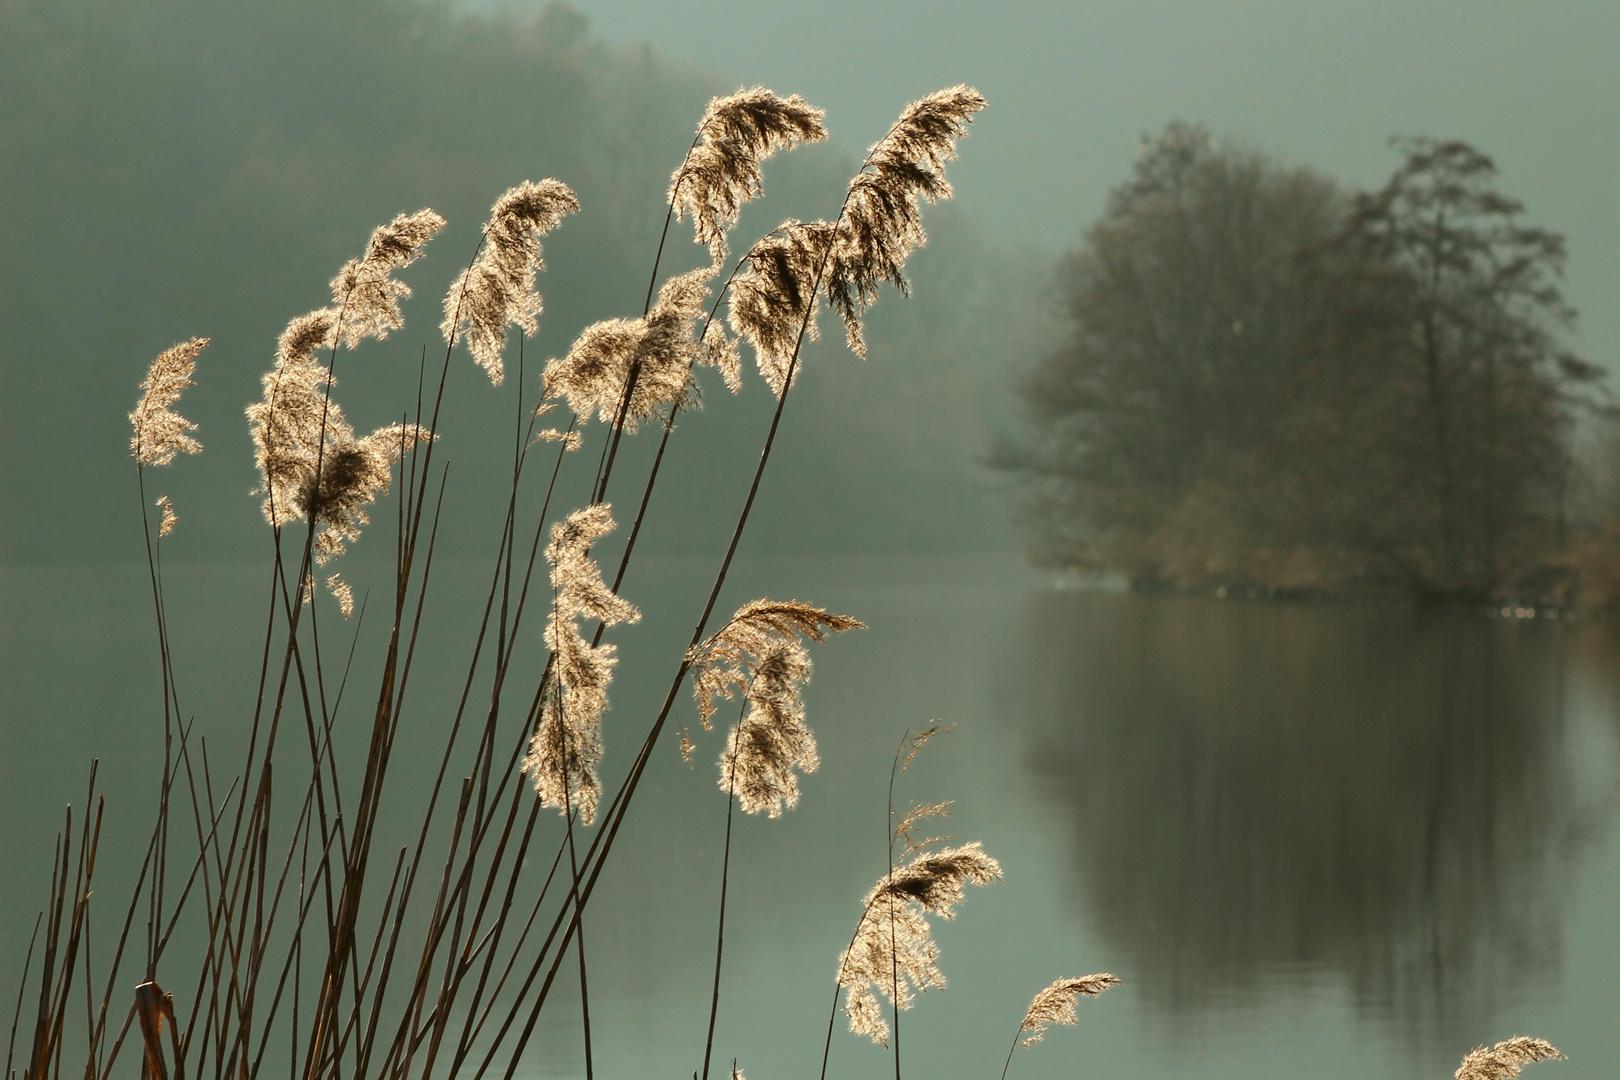 Nachmittag am Fluss